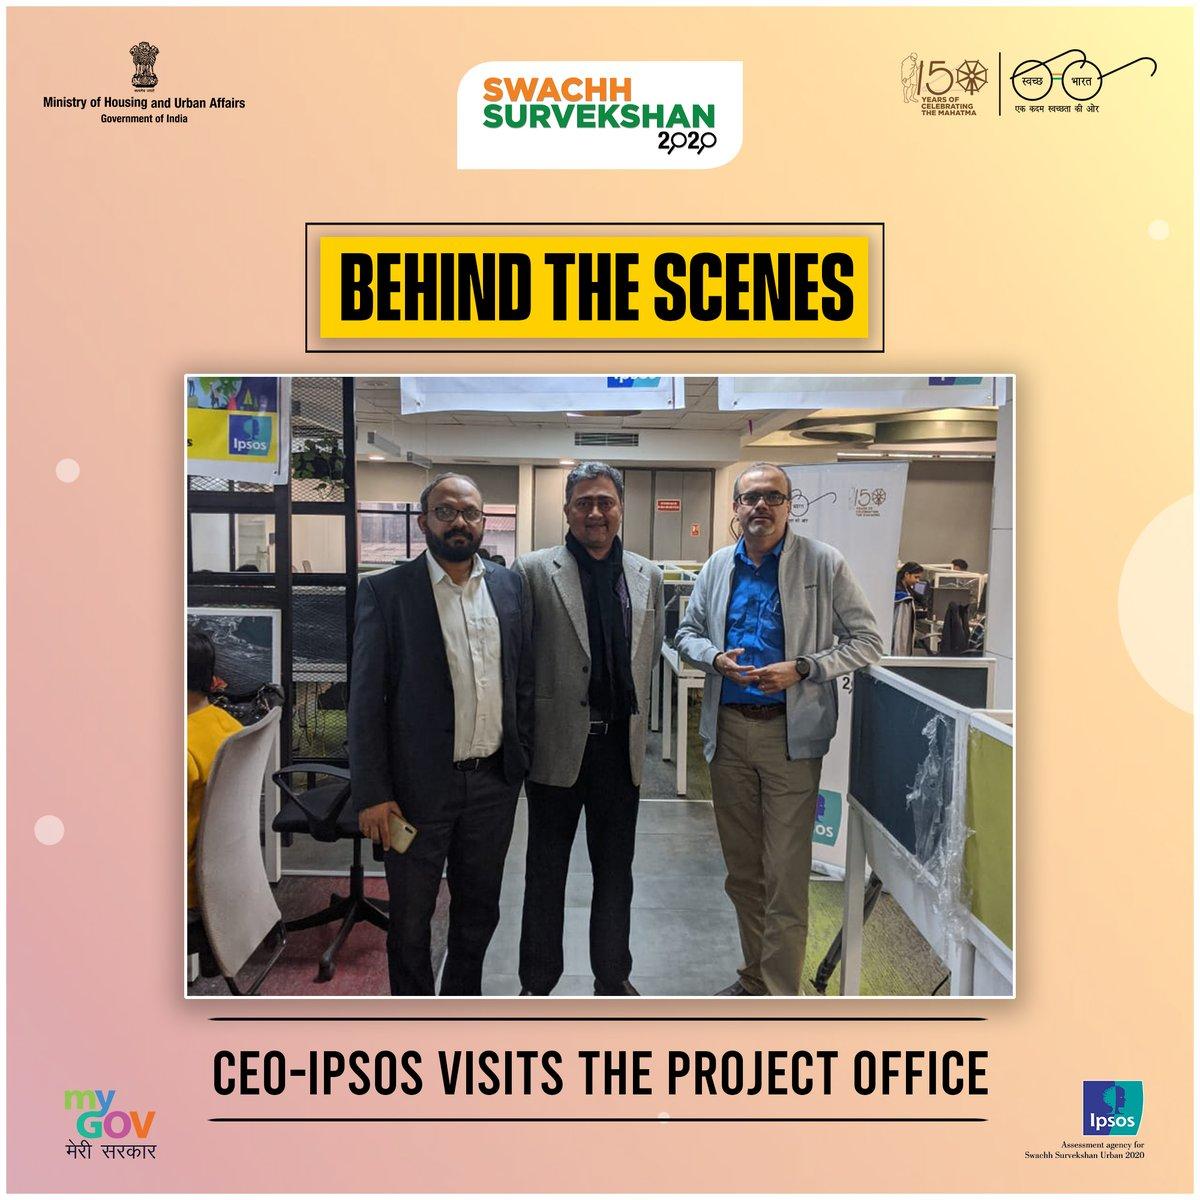 Take a peak #BehindTheScenes of #SwachhSurvekshan2020.  Mr Amit Adarkar, CEO of Ipsos - the assessment agency for Swachh Survekshan 2020,   #SwachhBharat #BTS https://t.co/KSeKUe8m3Z